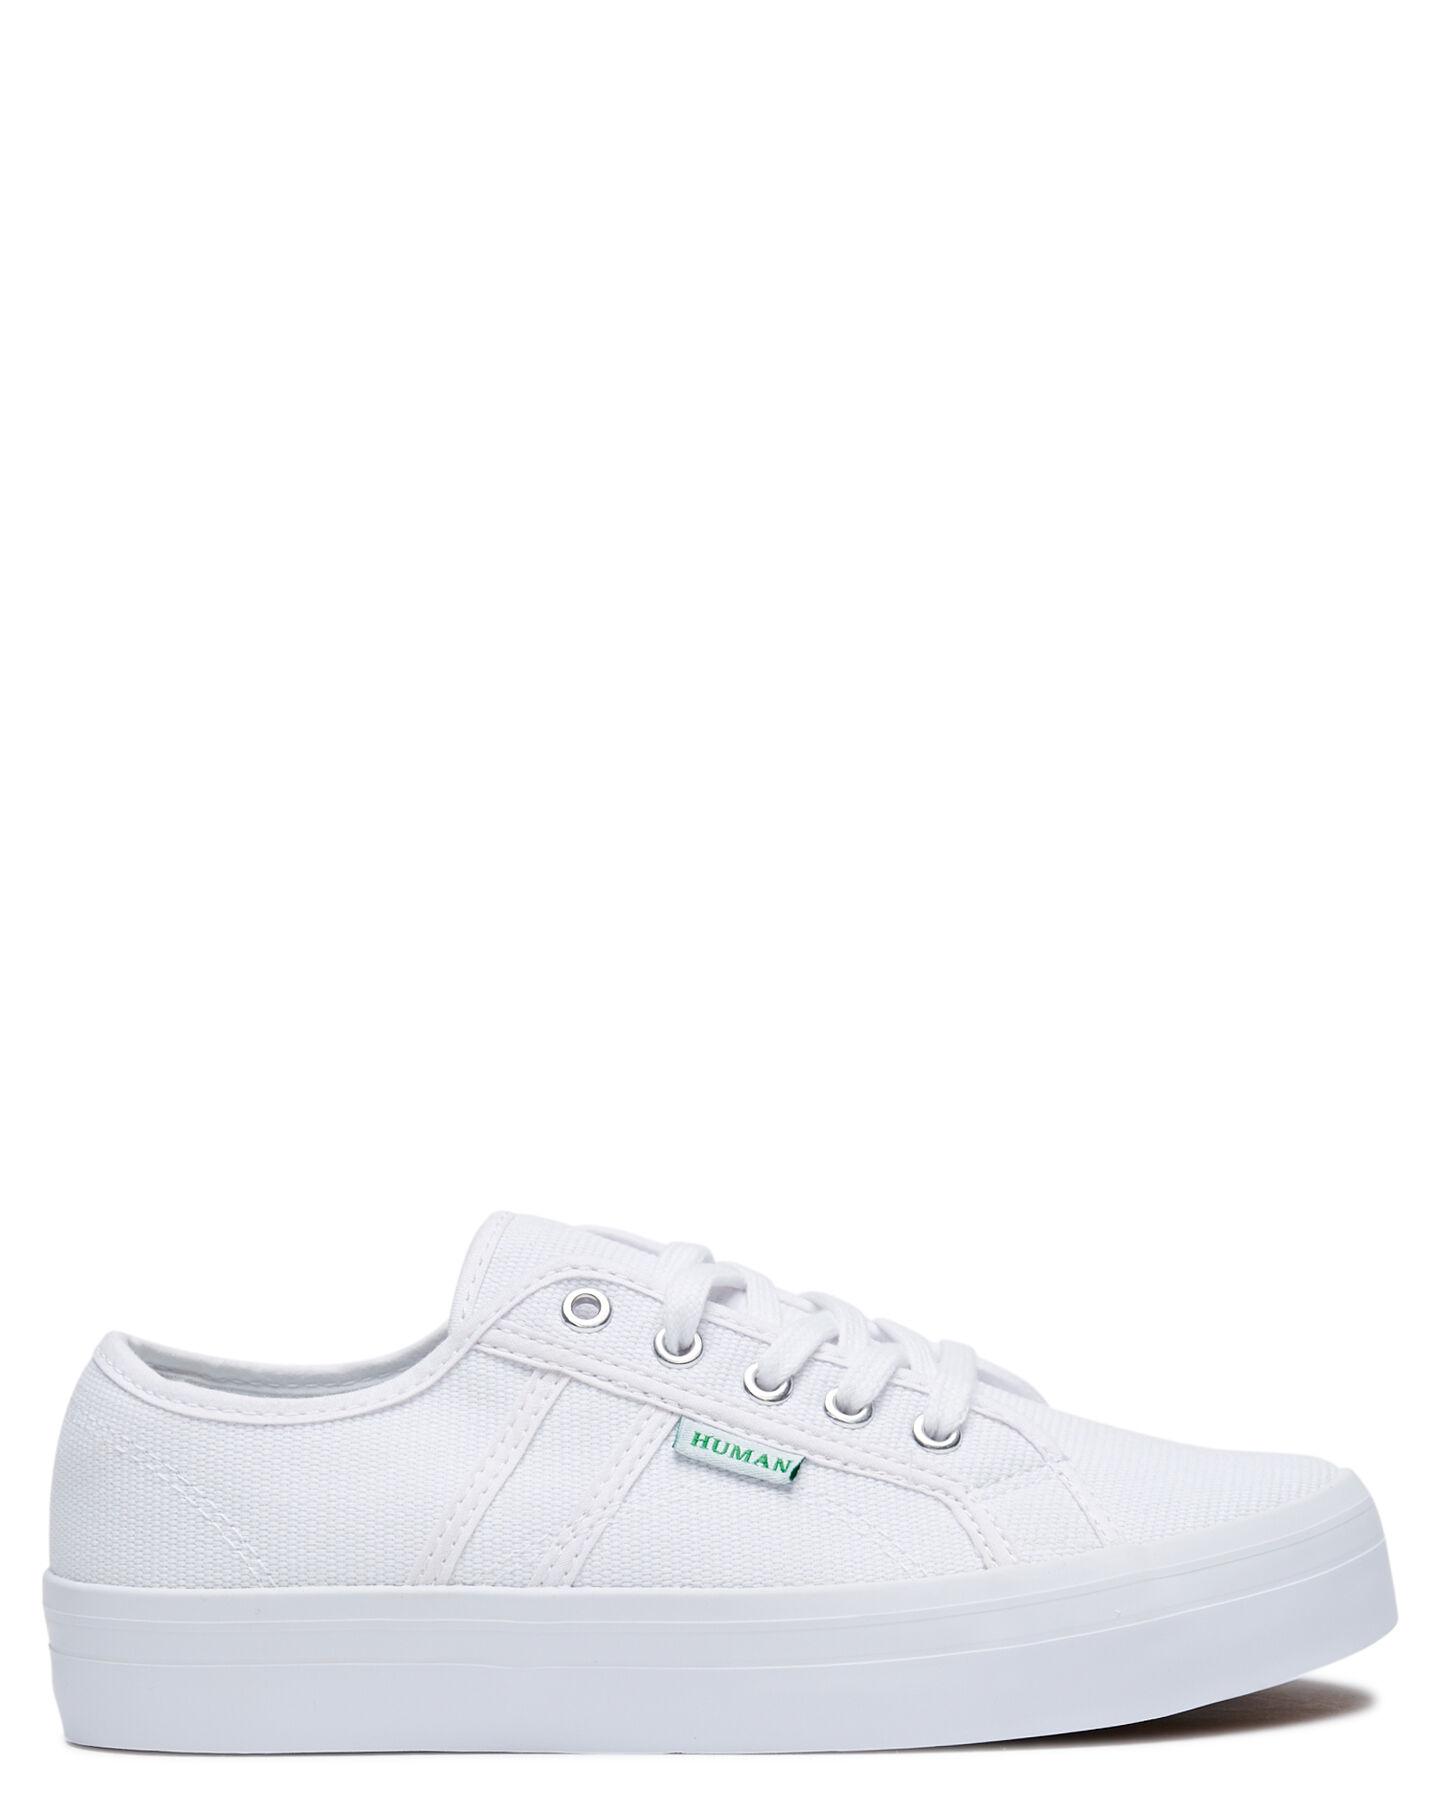 Footwear from Dina Fashion